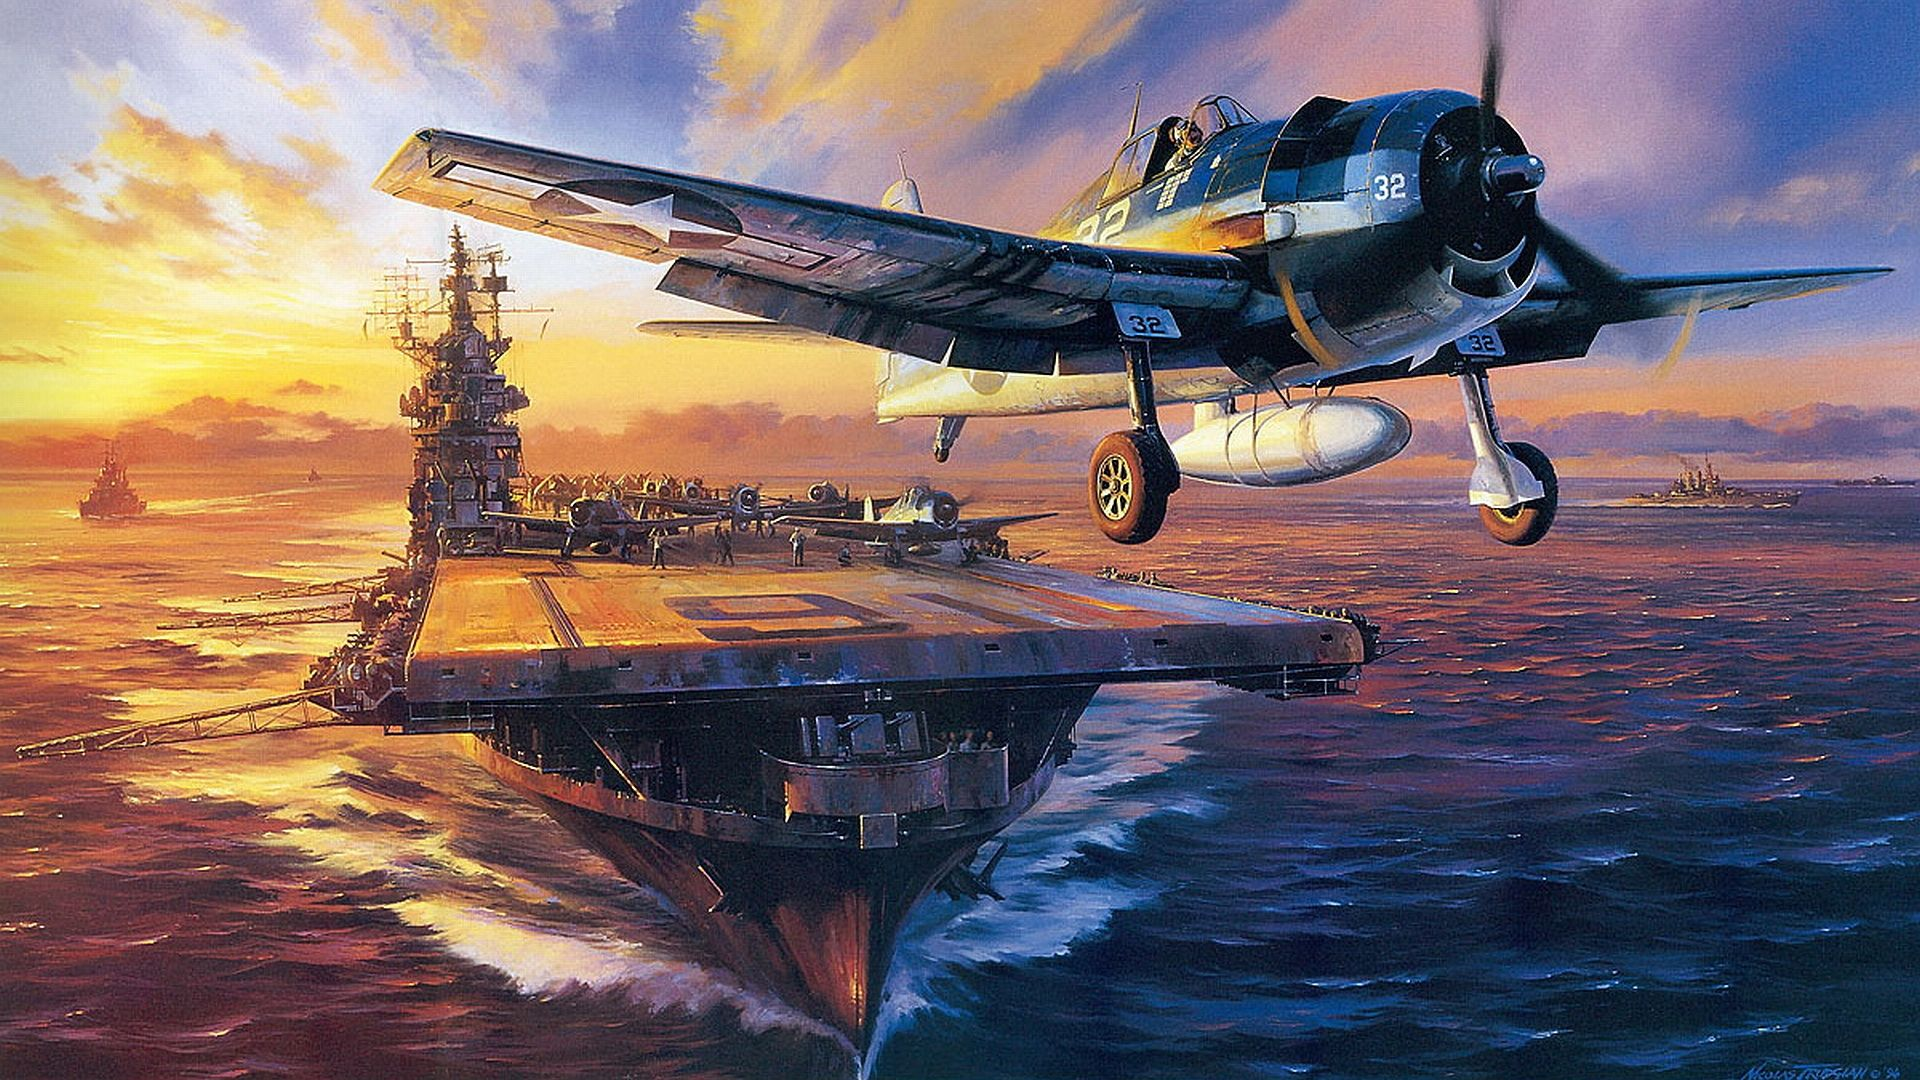 vintage aviation wallpaper desktop background #rrxt 1920x1080 px